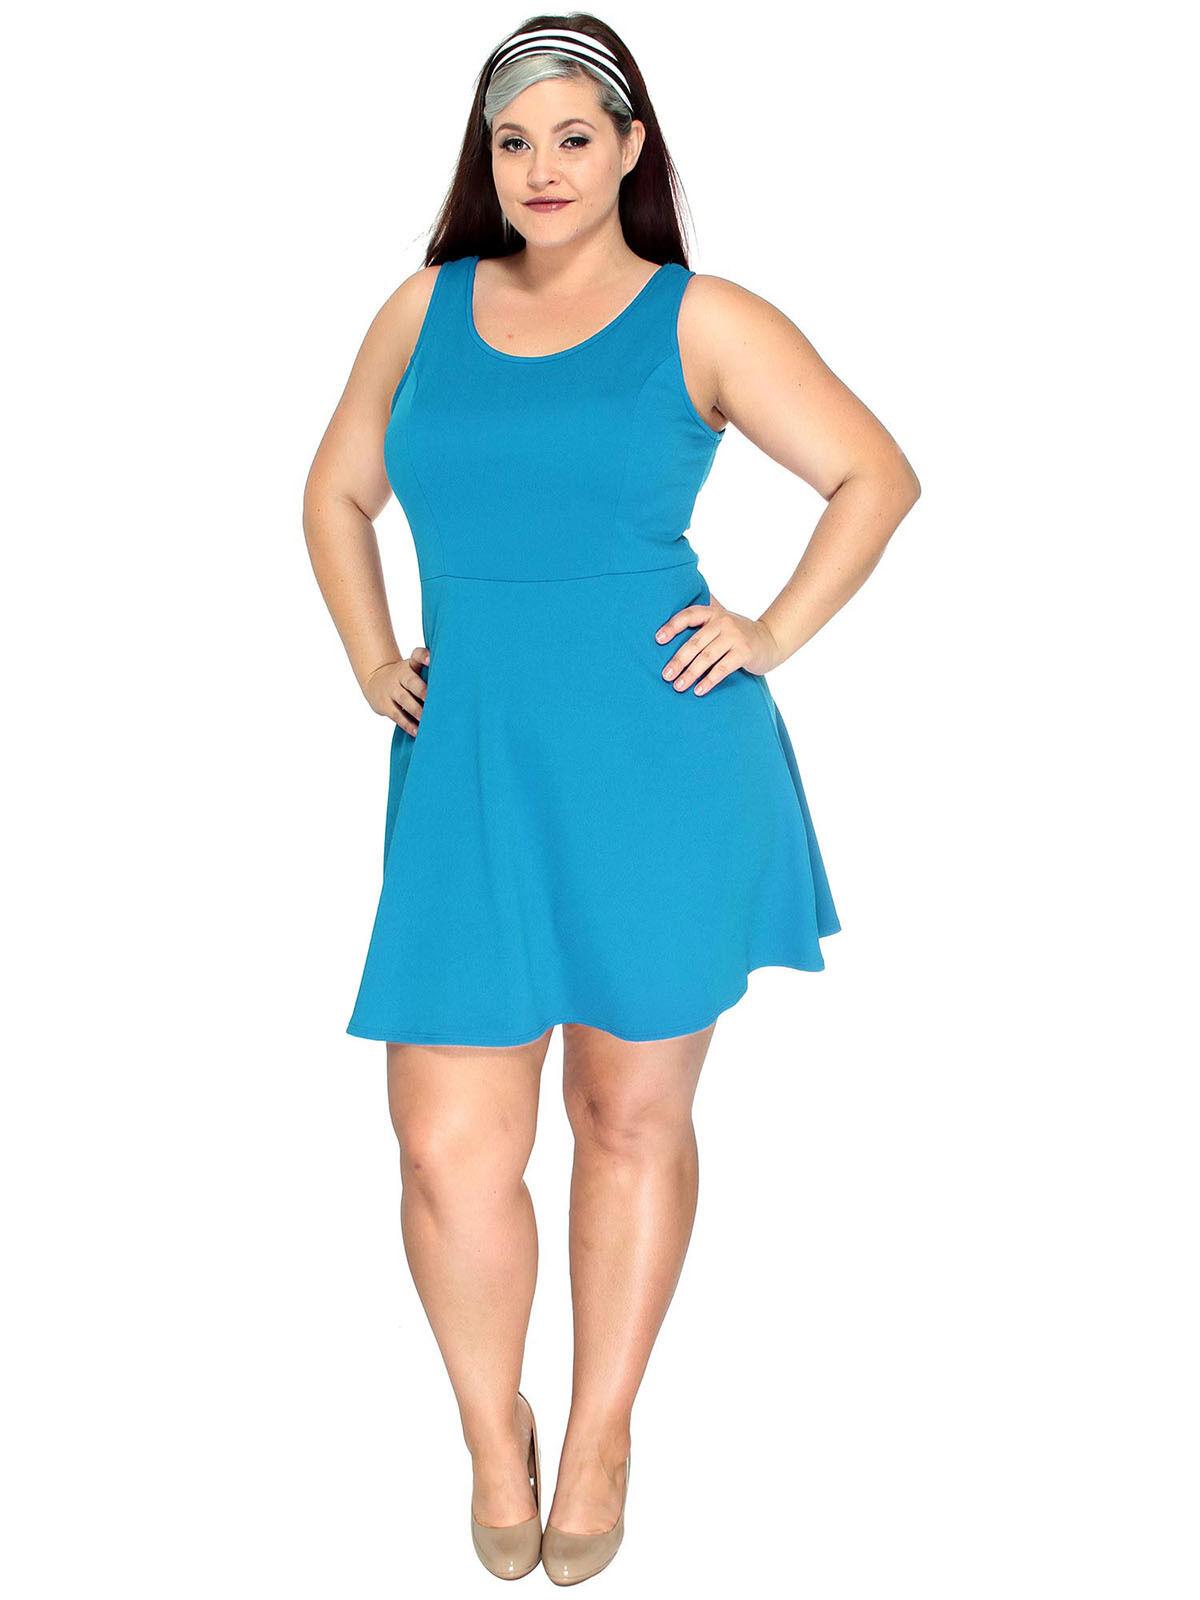 Plus Size Women Dress Casual Party Evening Sleeveless Short Mini ...